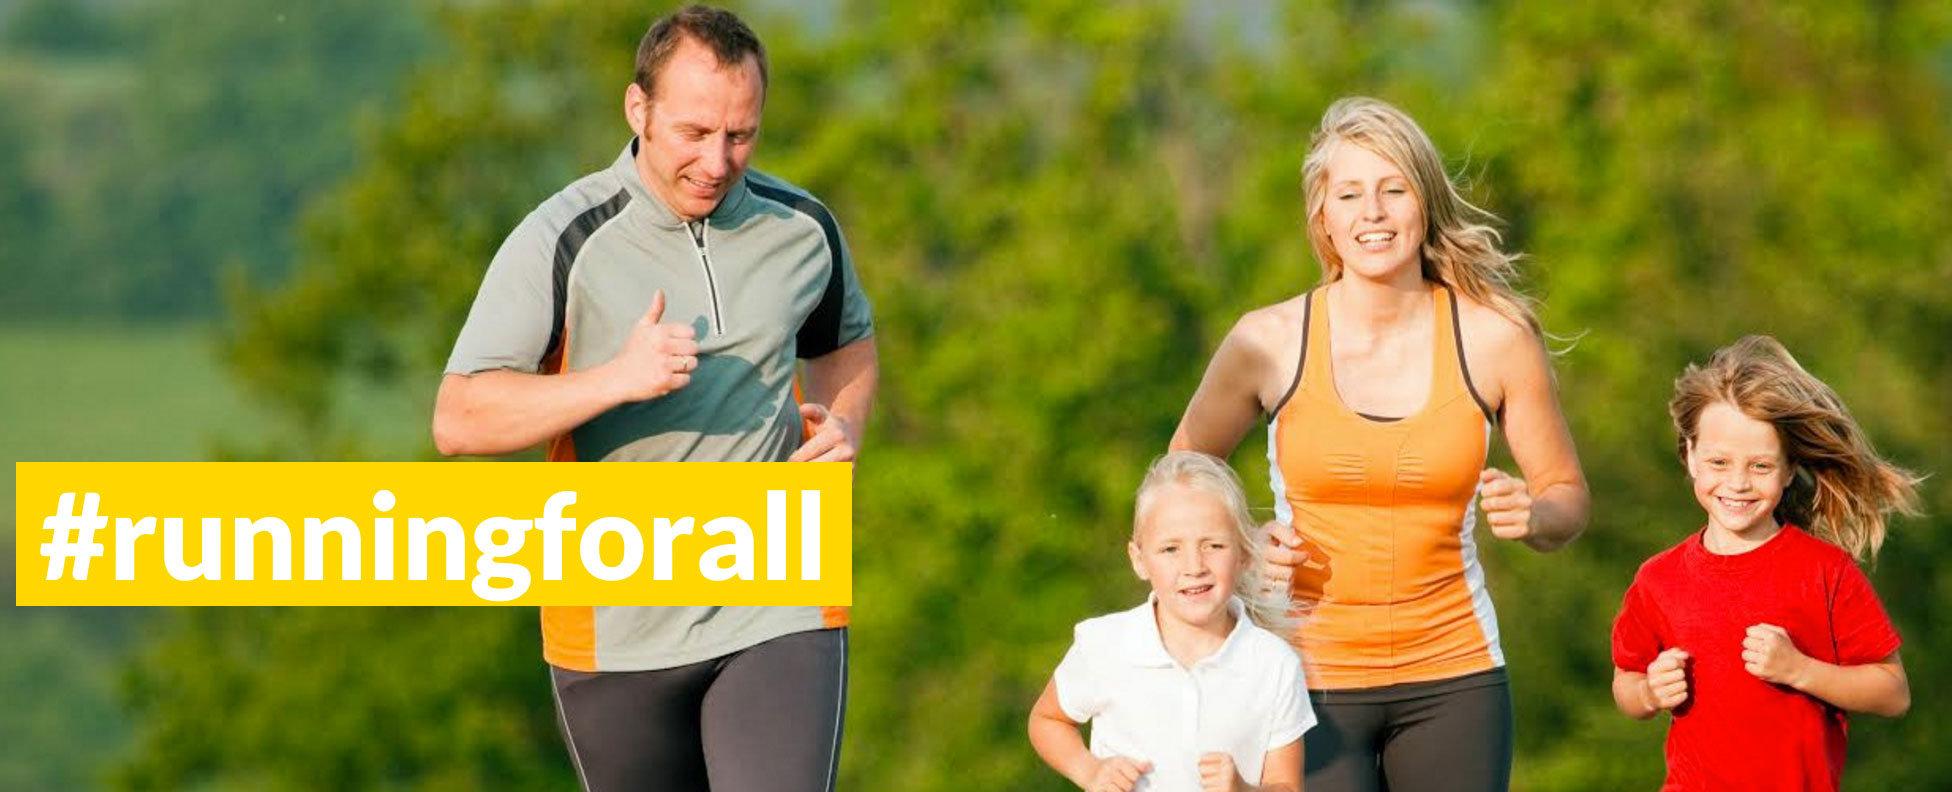 Renault Run5k #runningforall, das neue Lauferlebnis